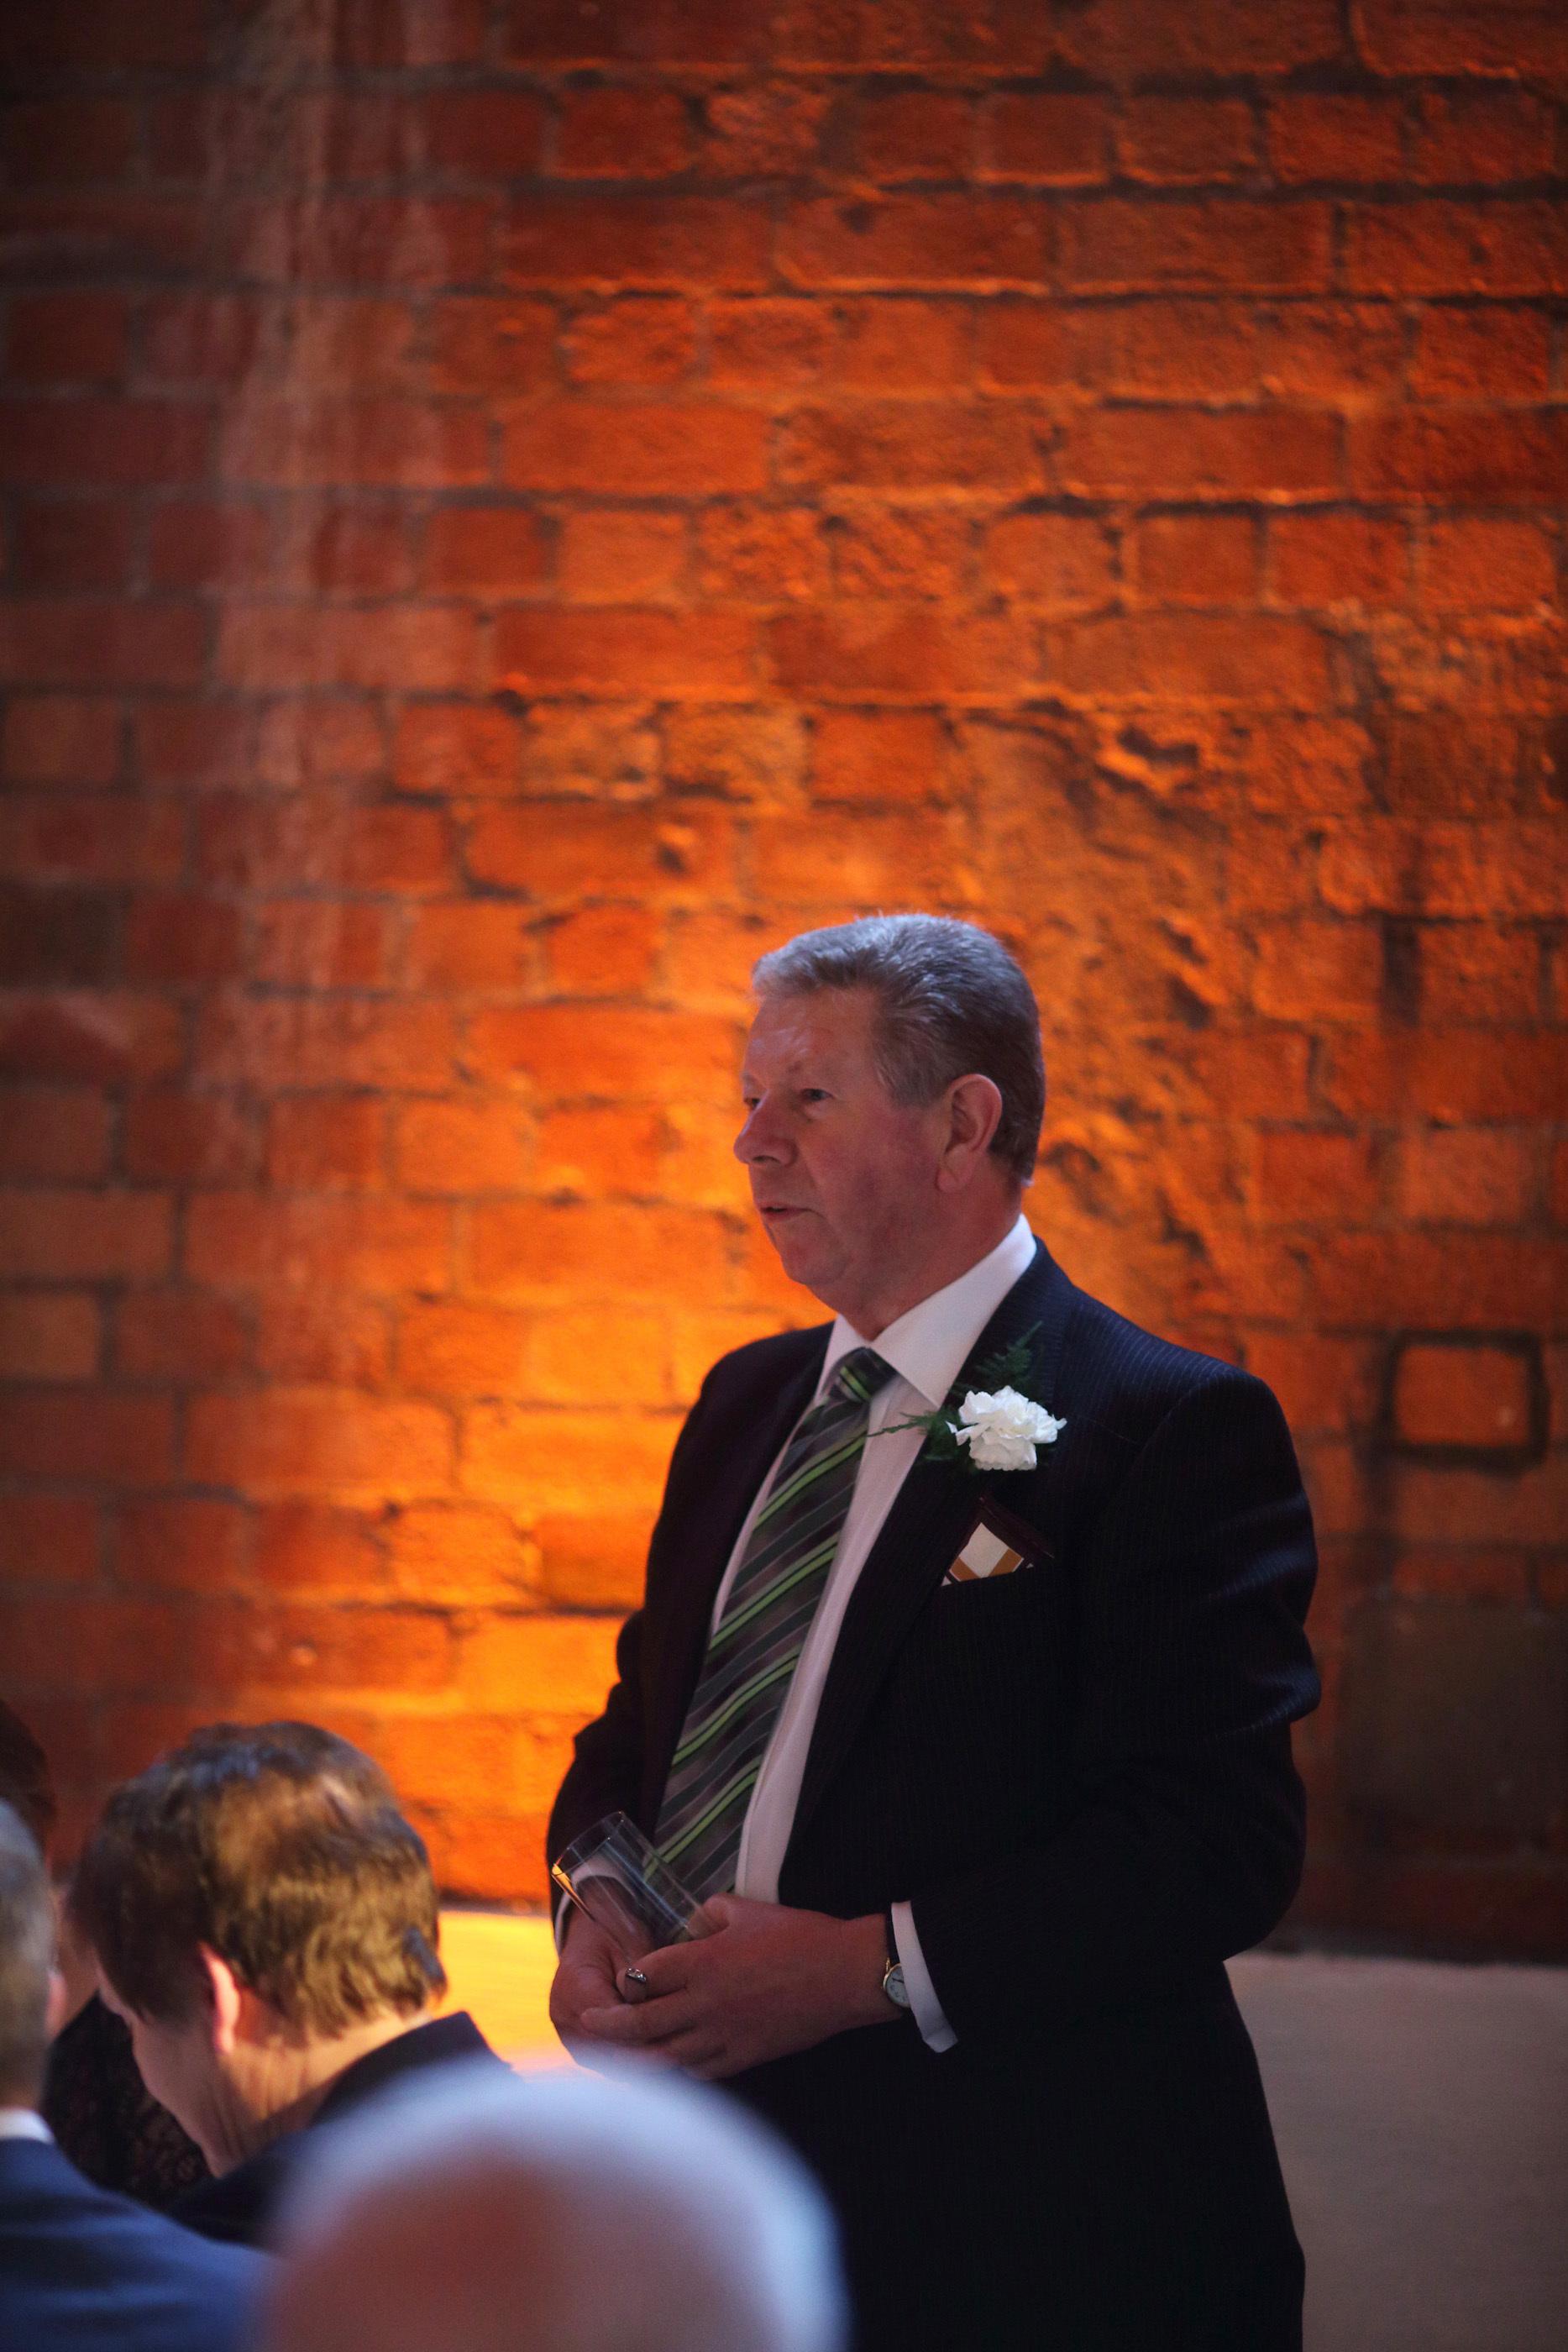 wedding-photography-paintworks-bristol-044.JPG